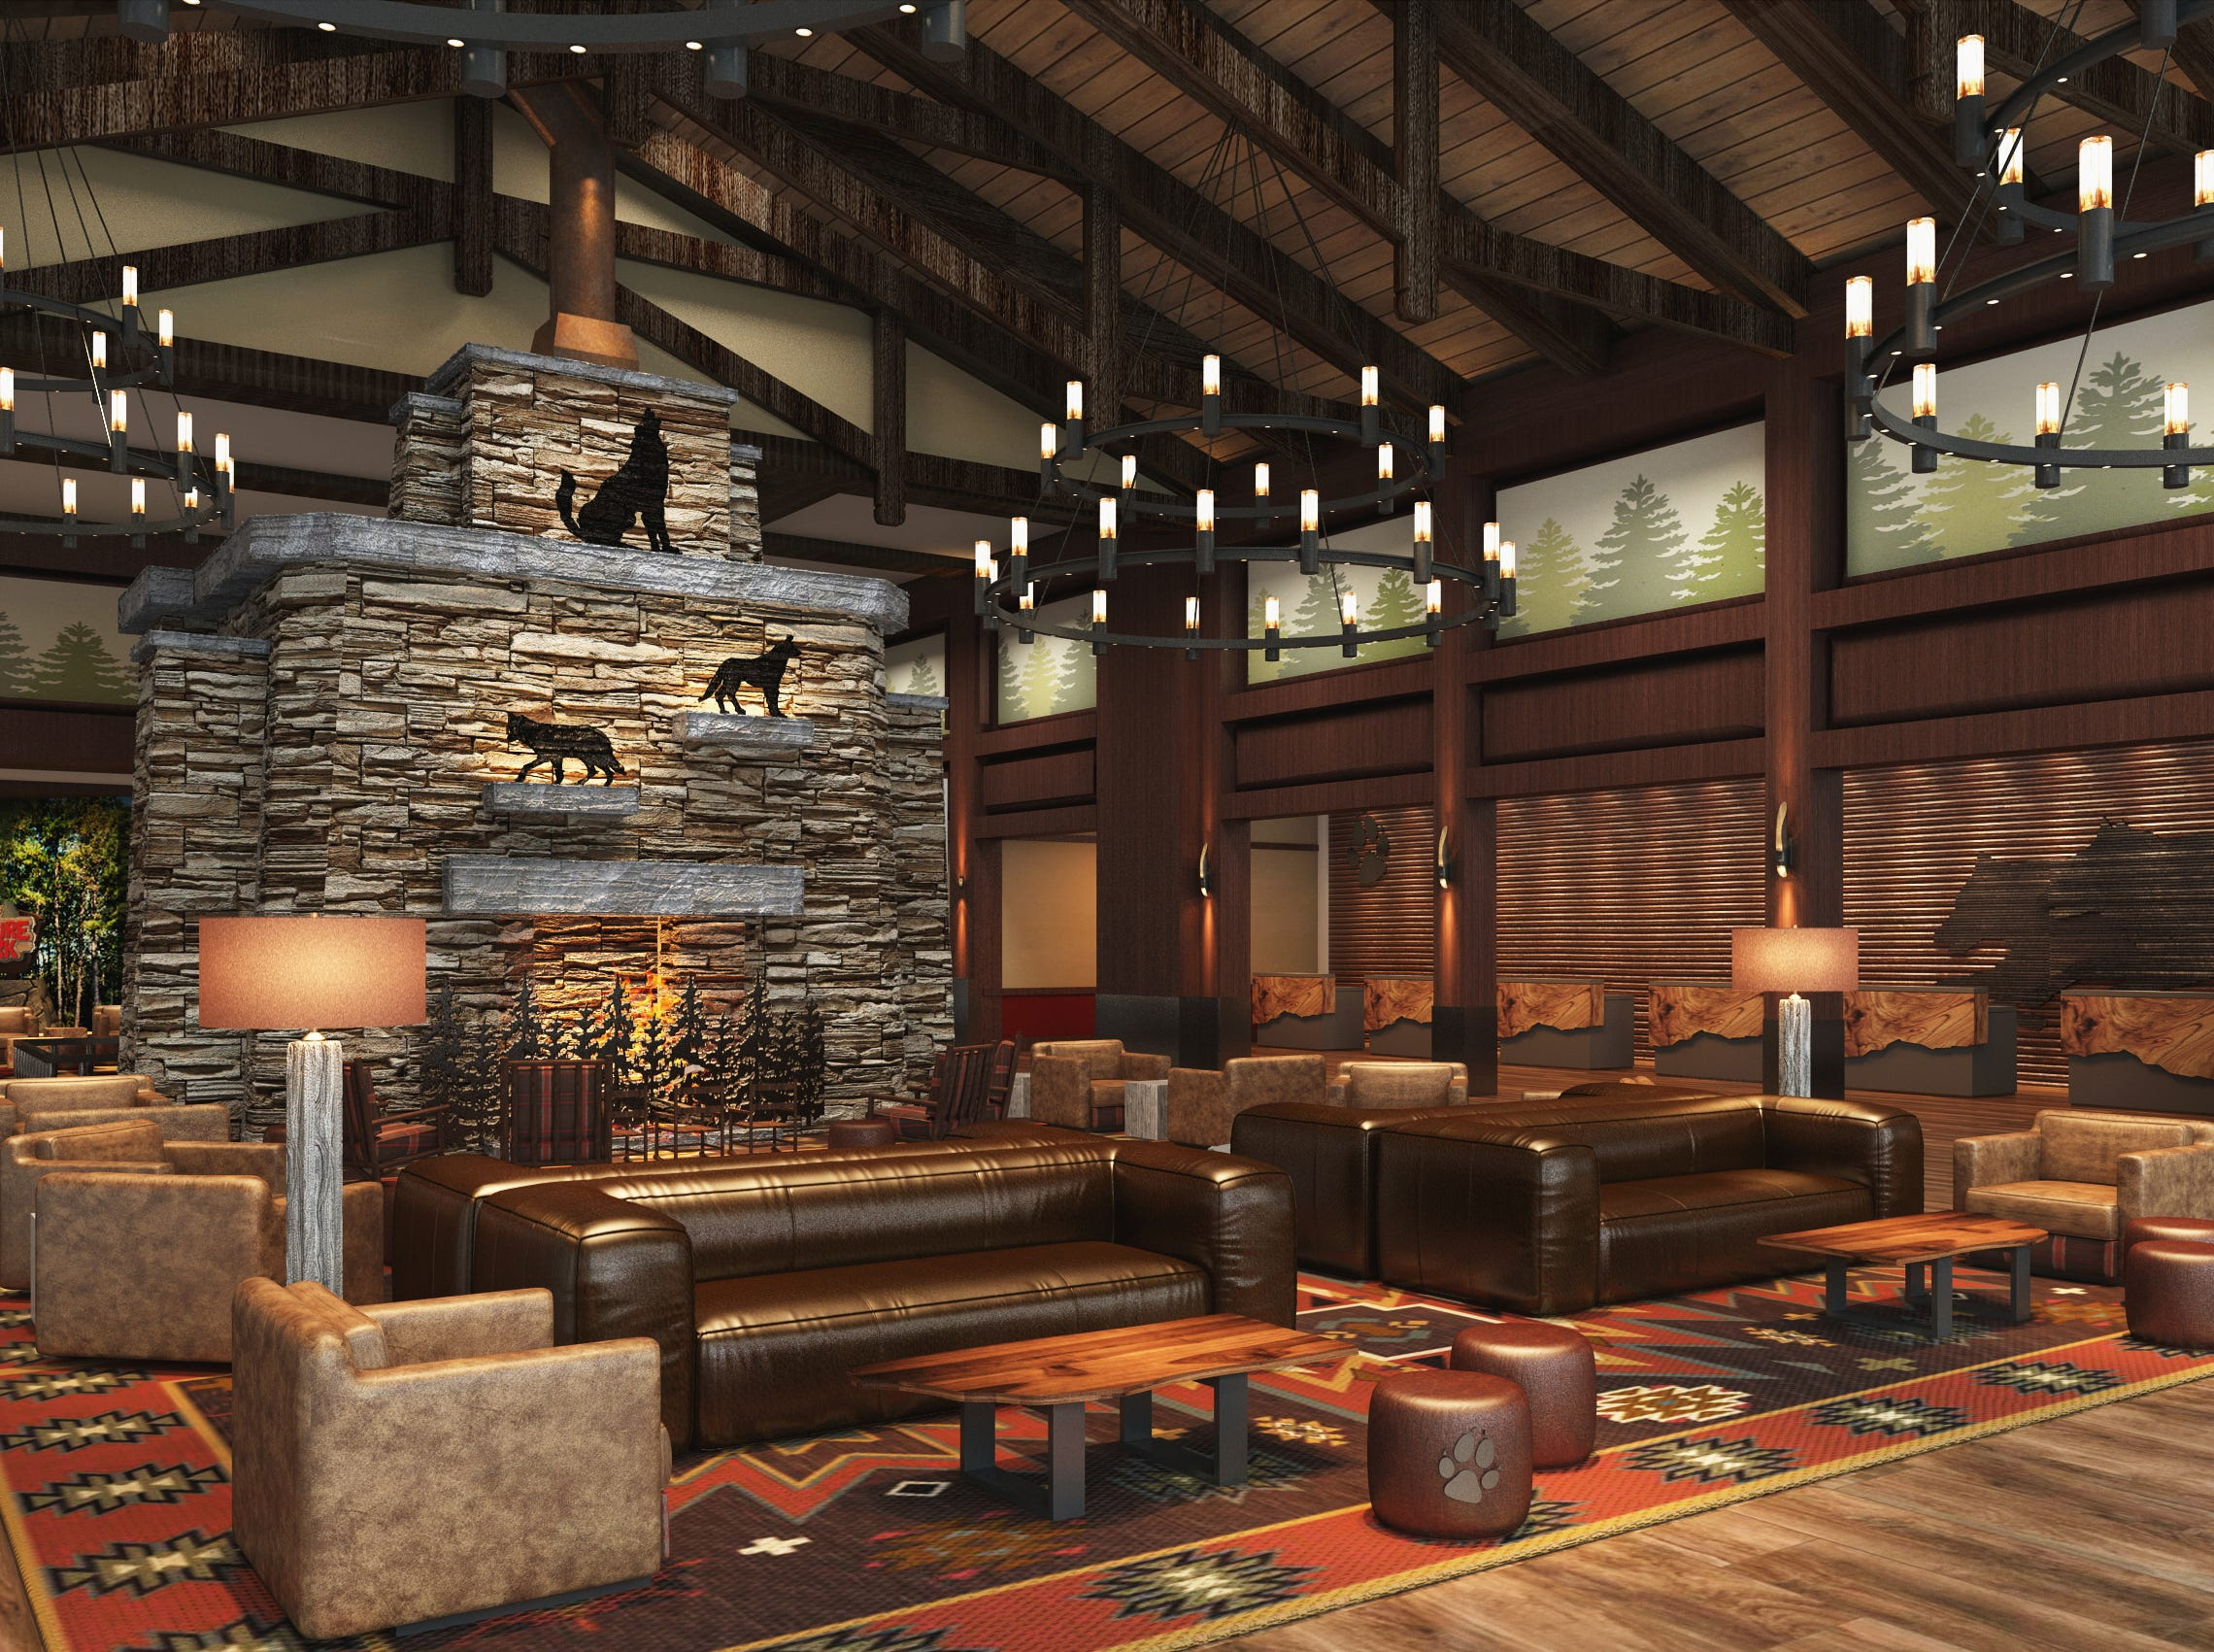 The lobby of the Great Wolf Lodge Arizona.